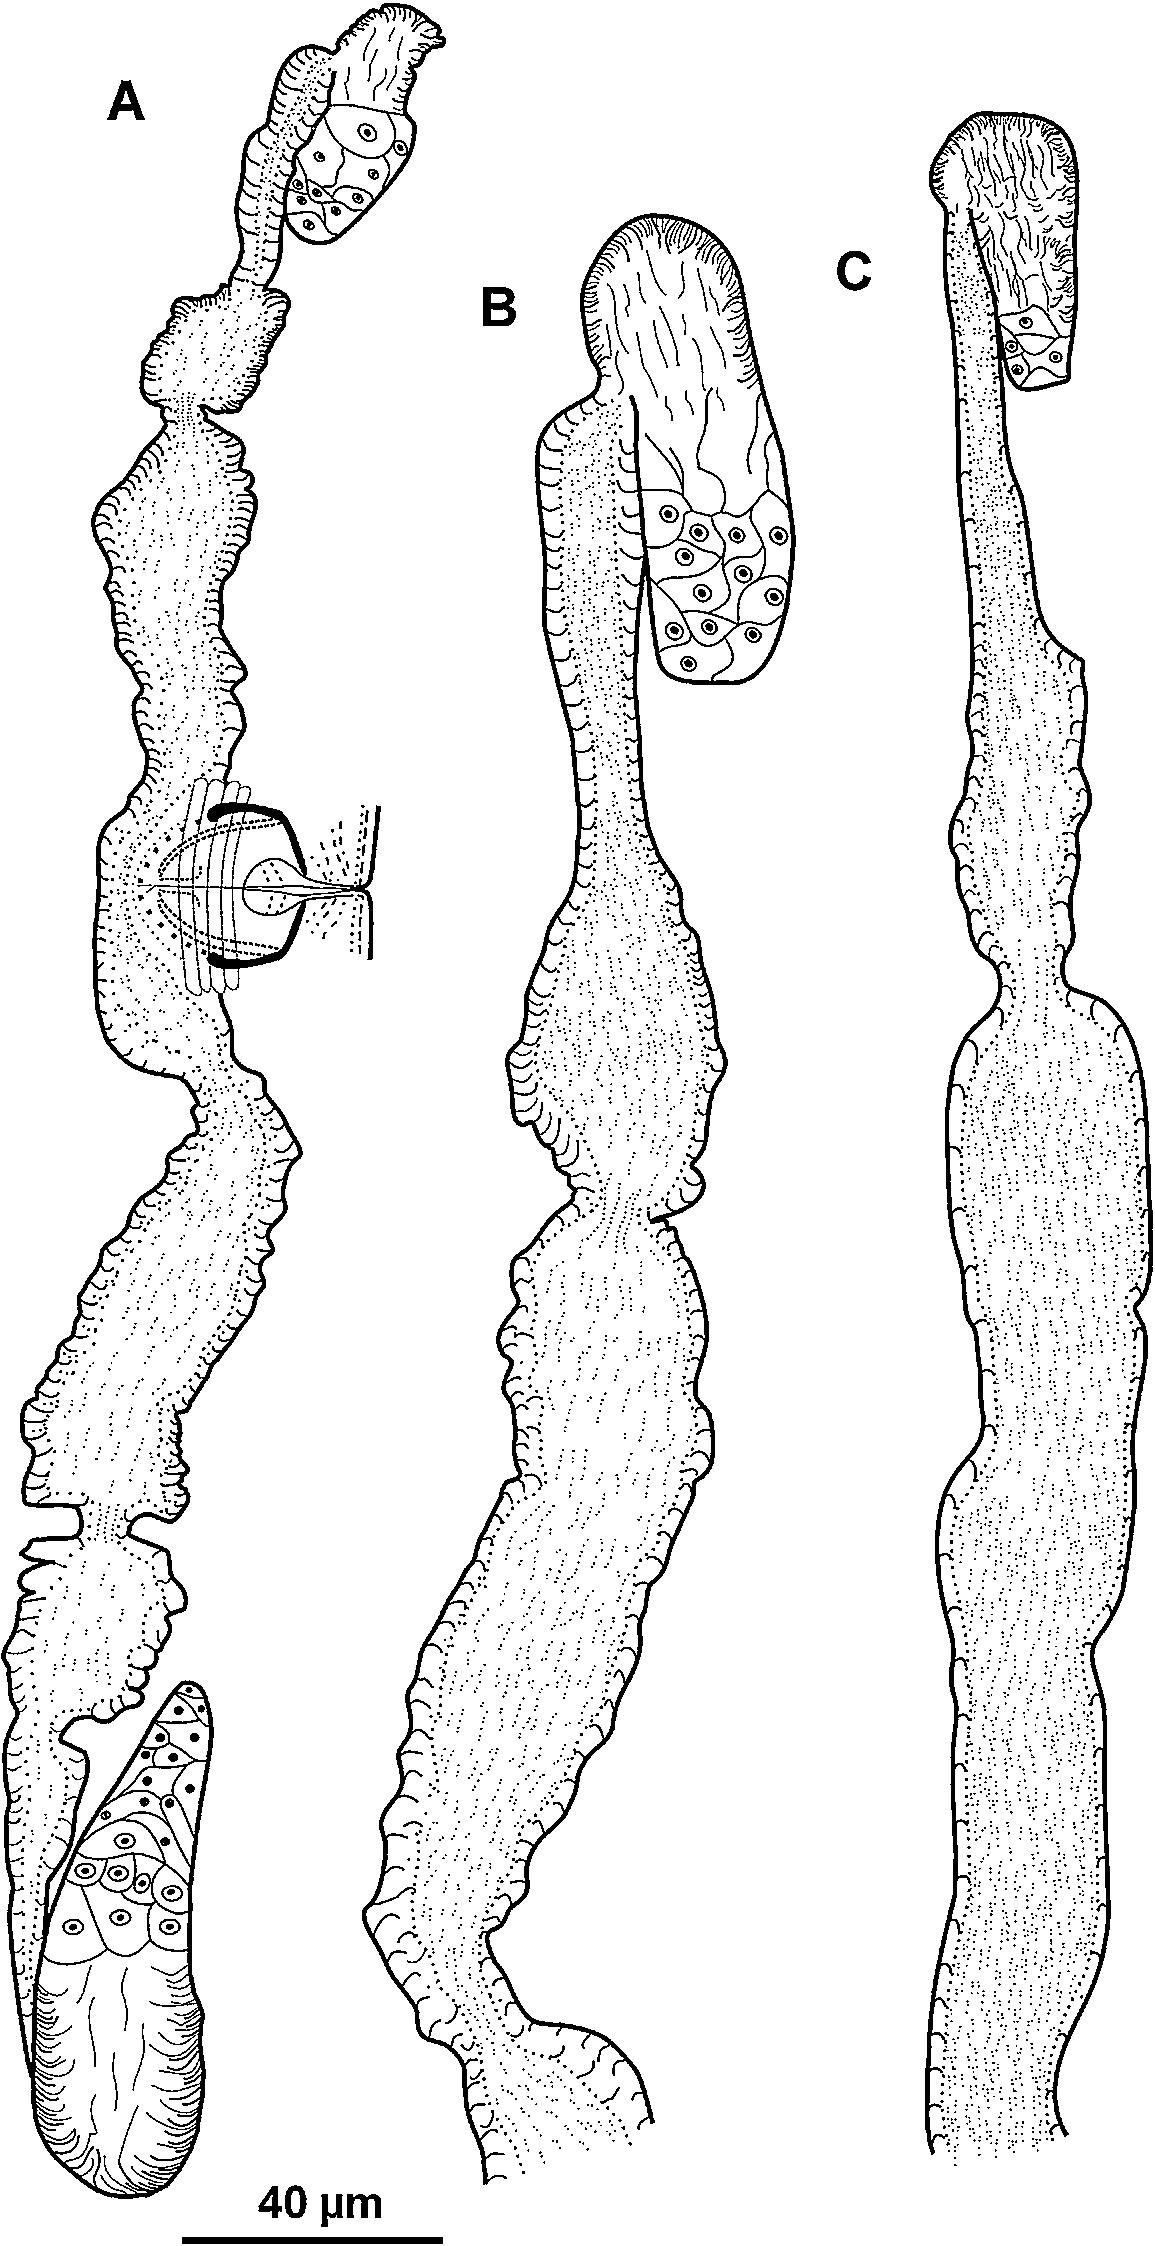 A new dagger nematode, Xiphinema poasense n  sp  (Nematoda